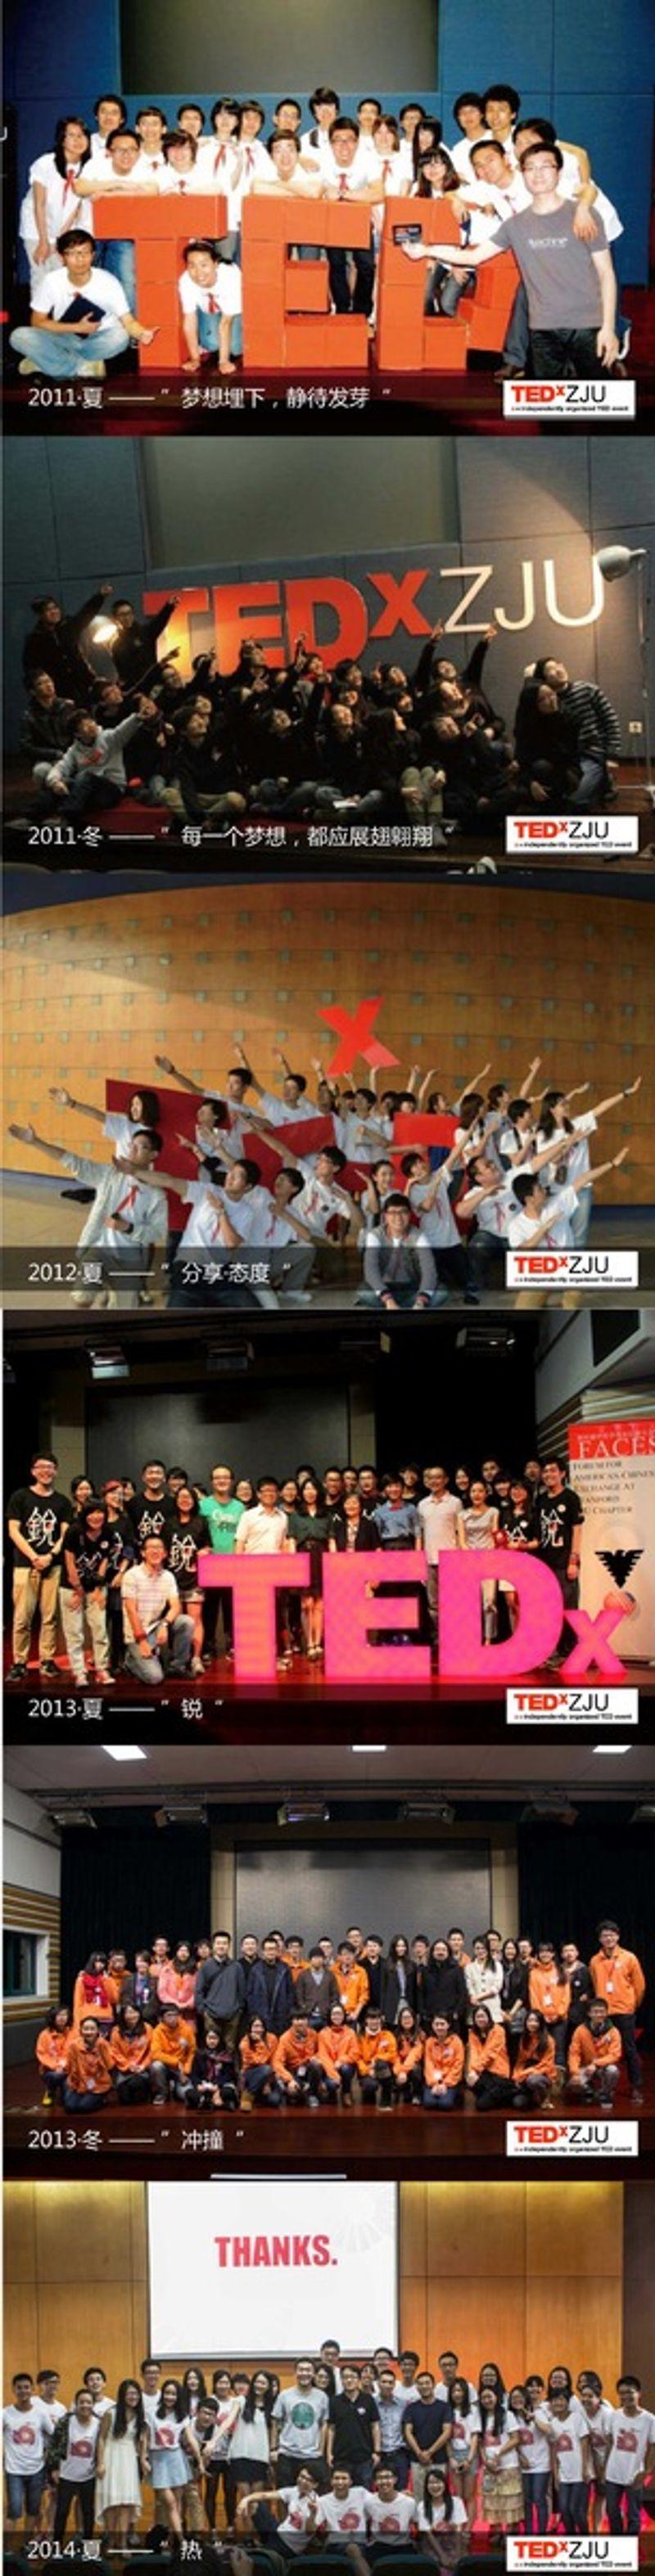 TEDxZJU